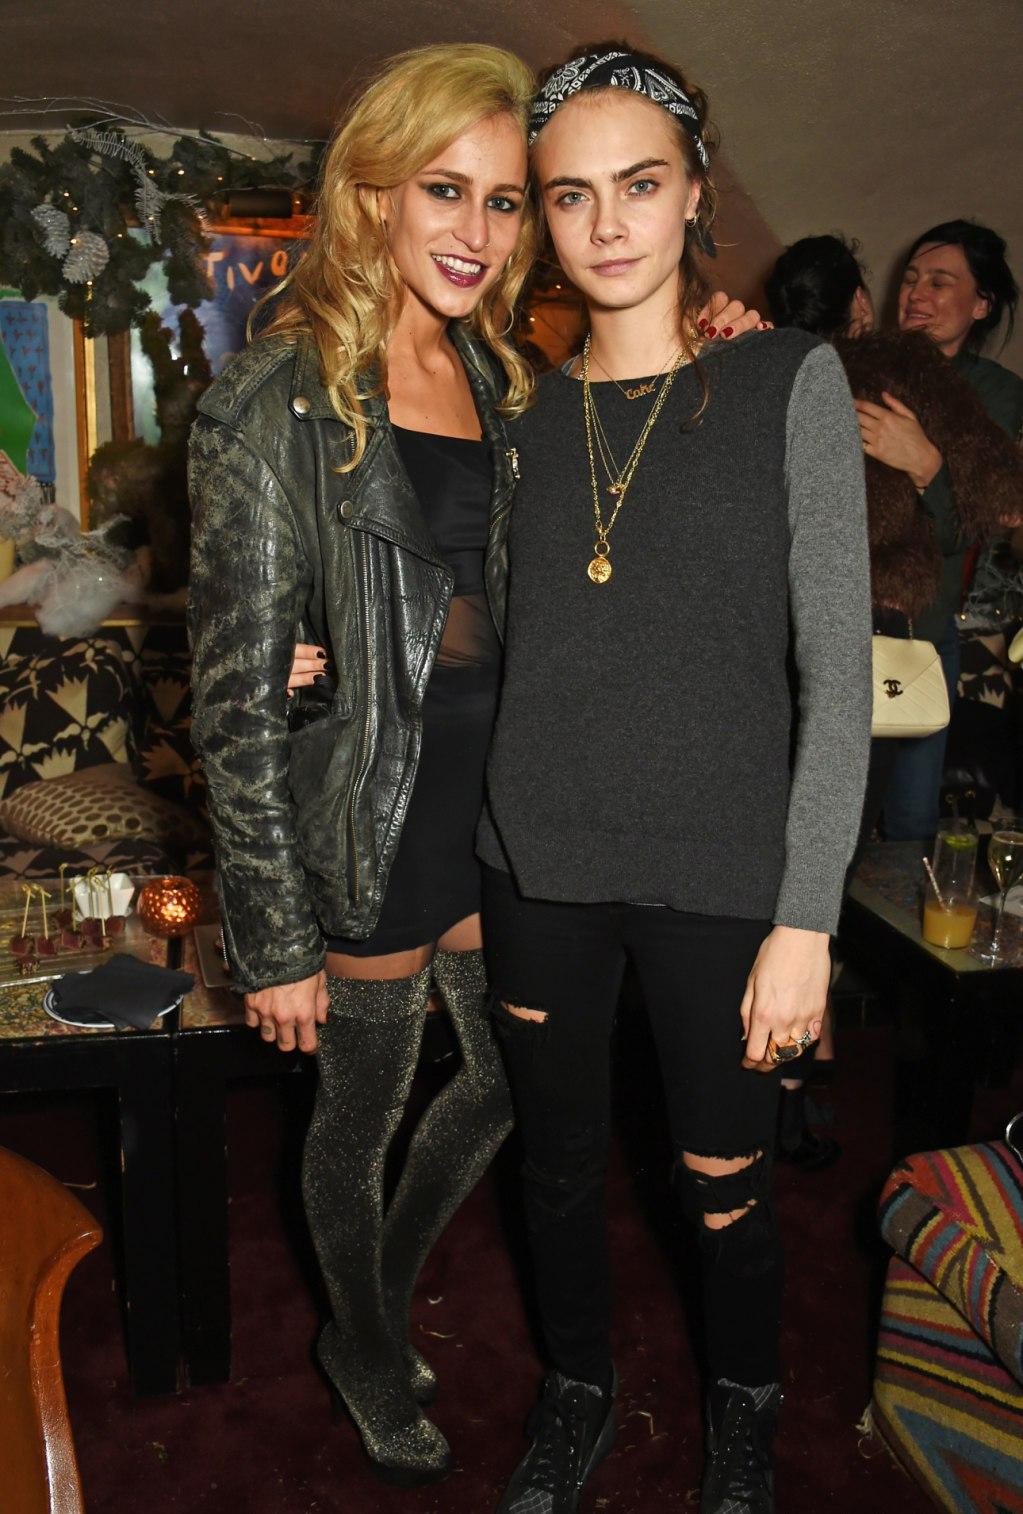 Alice Dellal, Poppy & Cara Delevingne attend LOVE Magazine Christmas Party